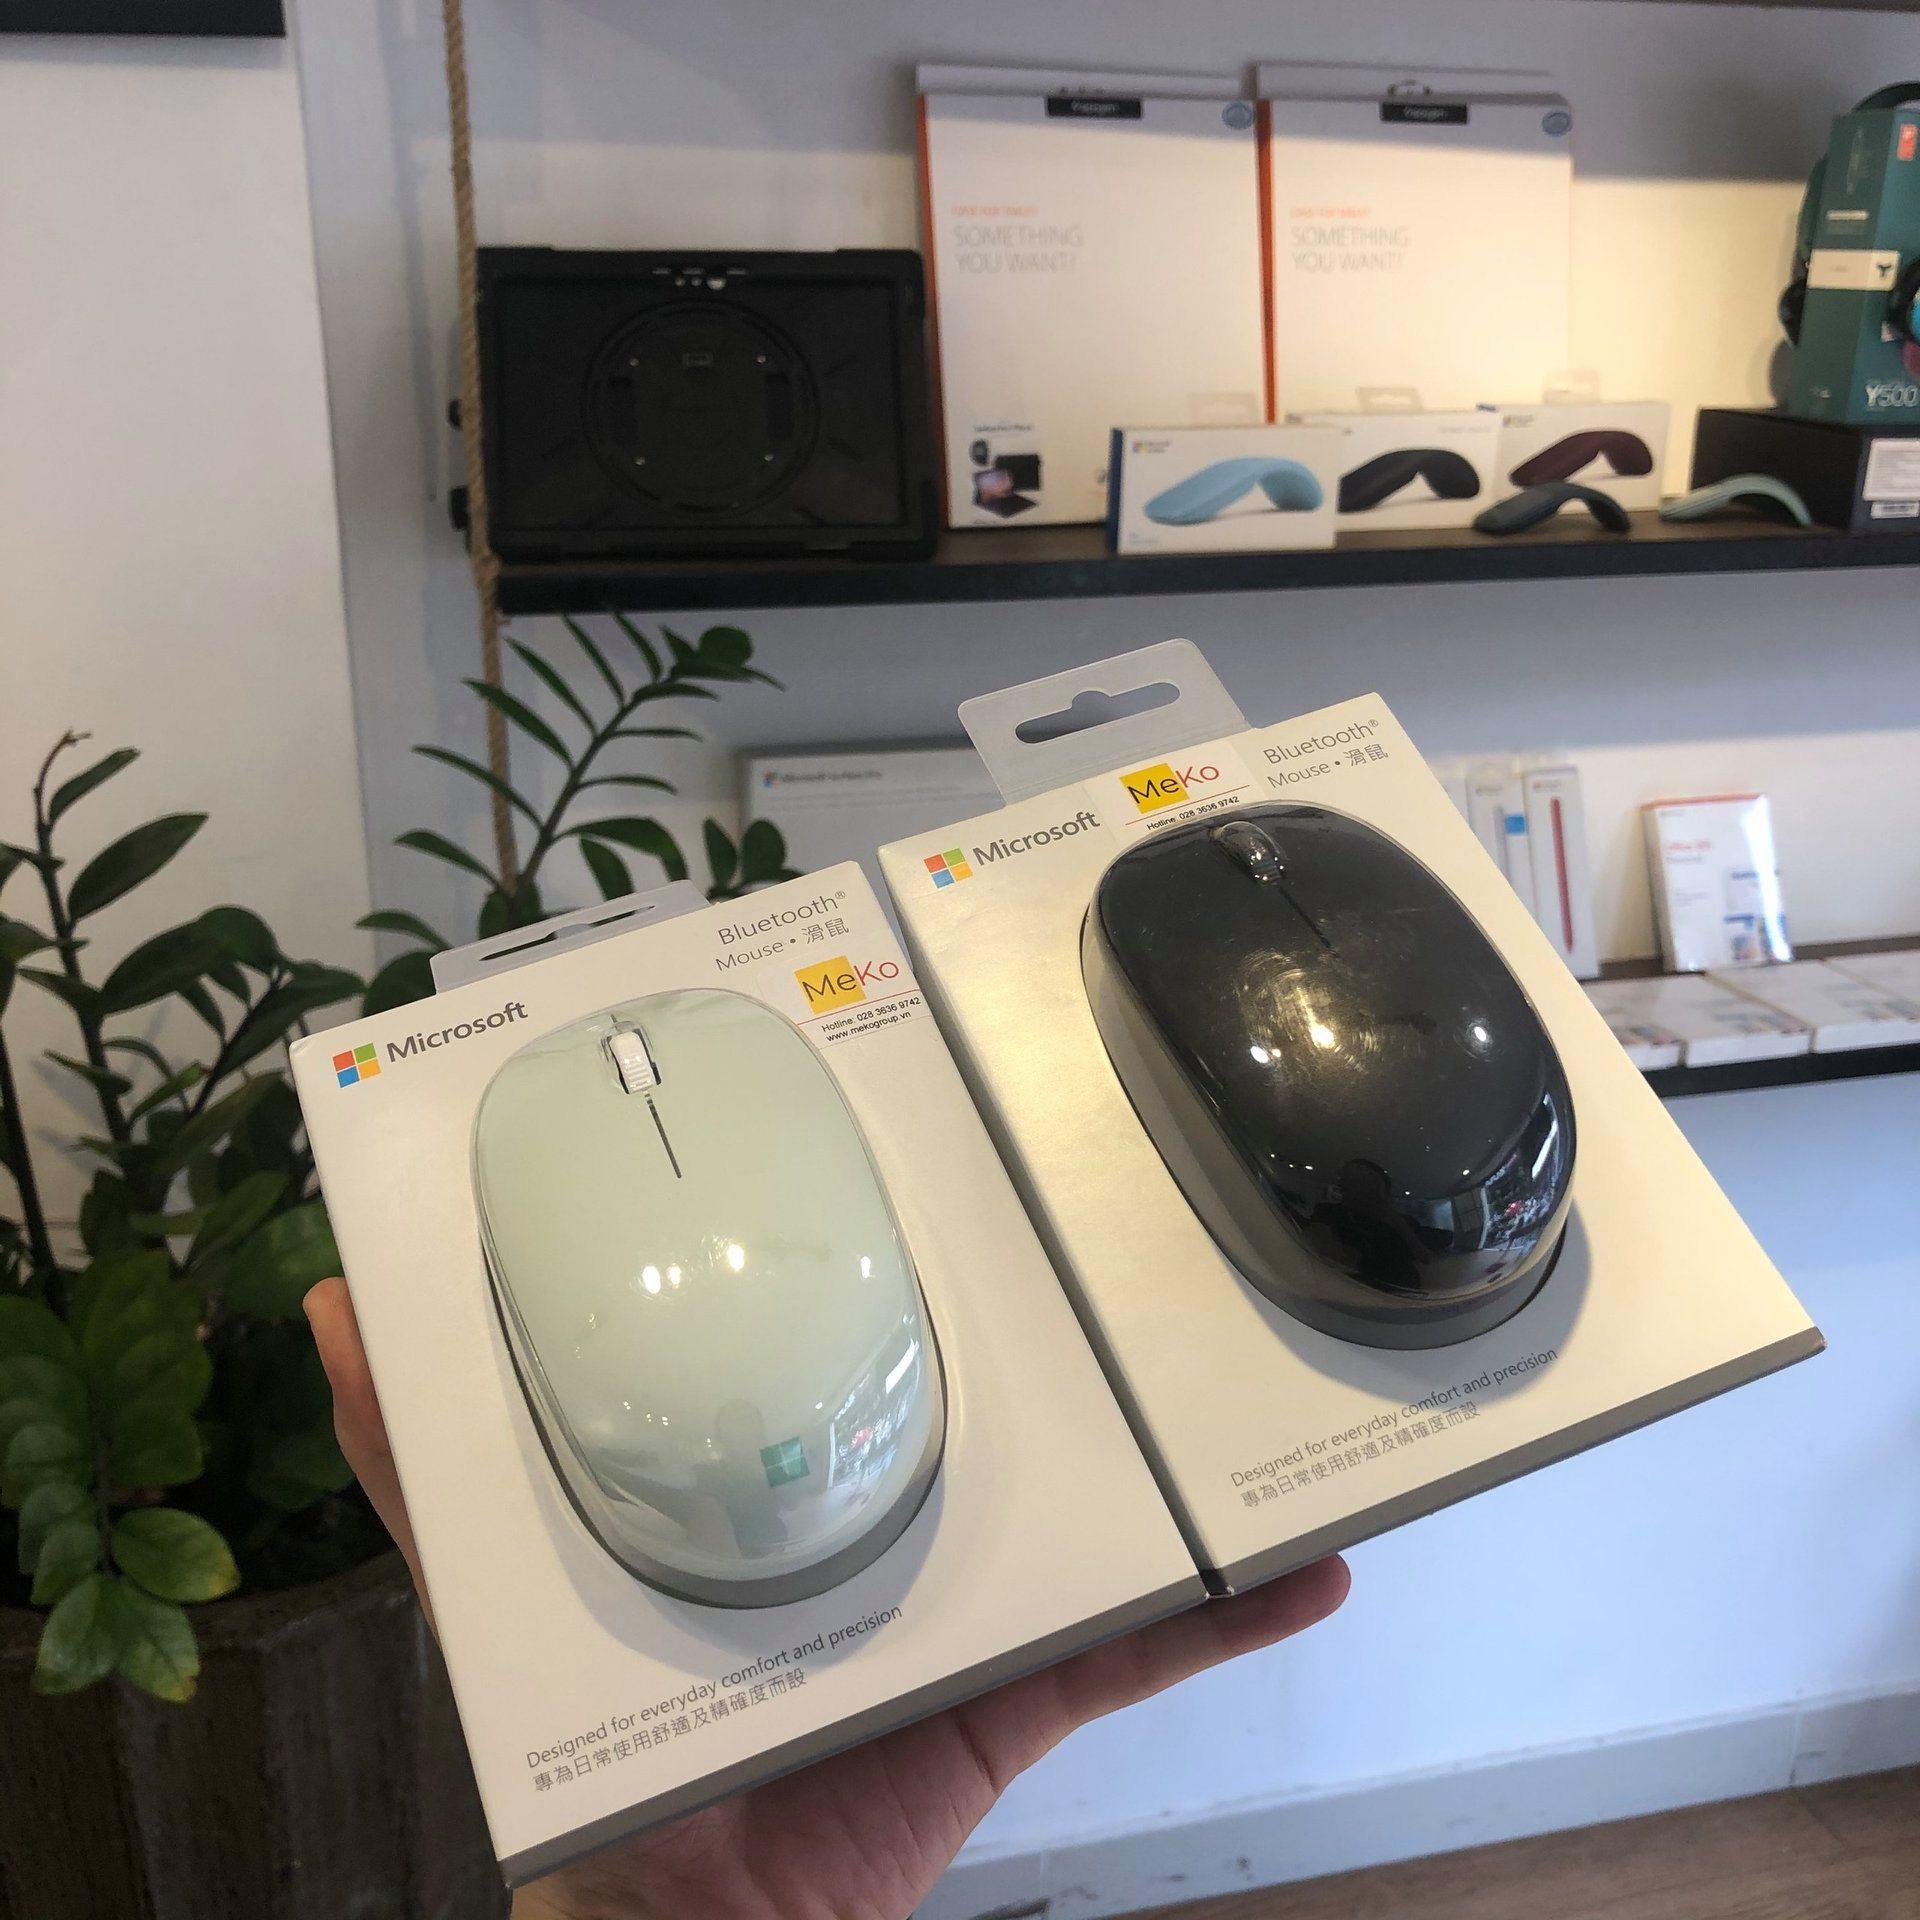 Microsoft Bluetooth Mouse 22